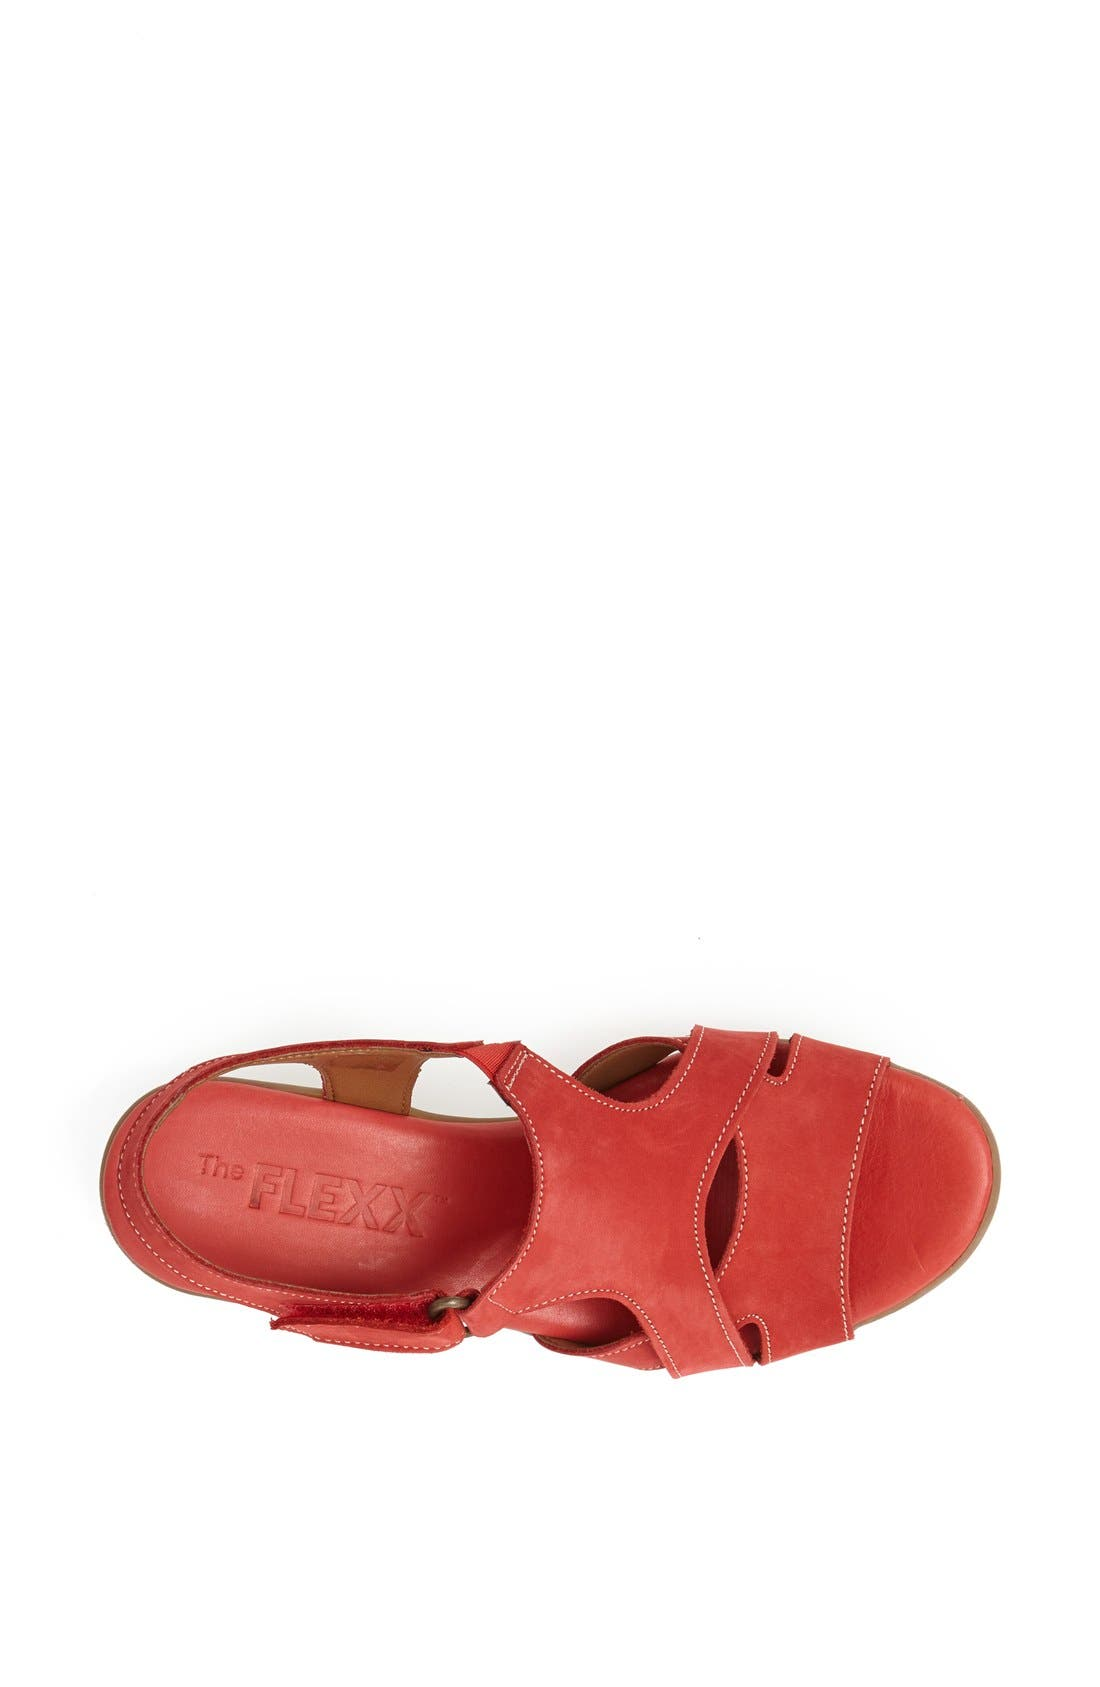 Alternate Image 3  - The FLEXX 'Clear Run' Sandal